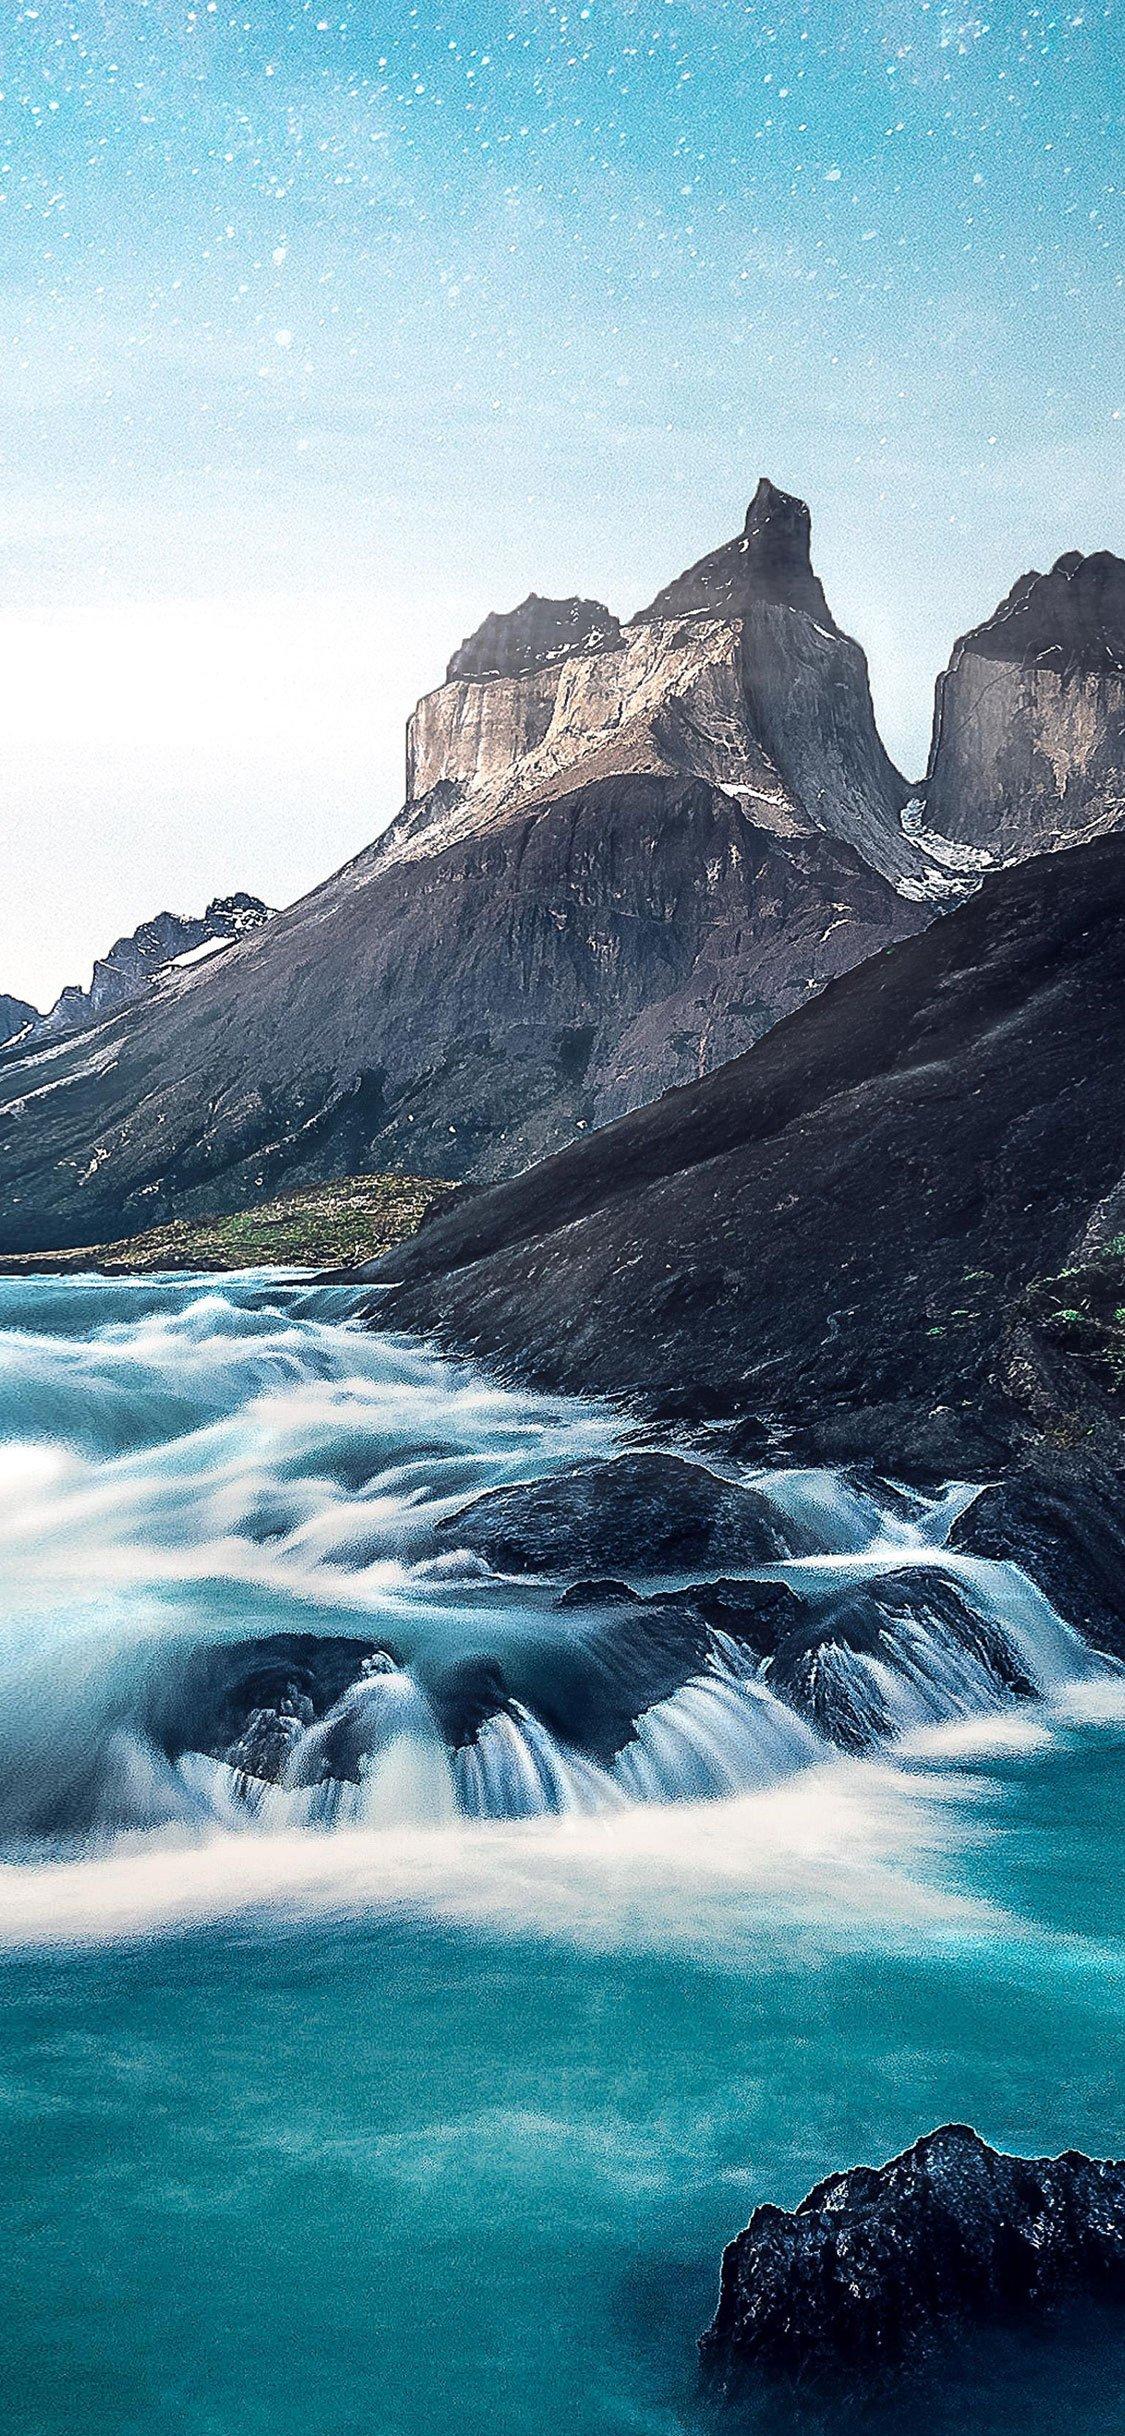 Lake Mountain iPhone X Wallpaper